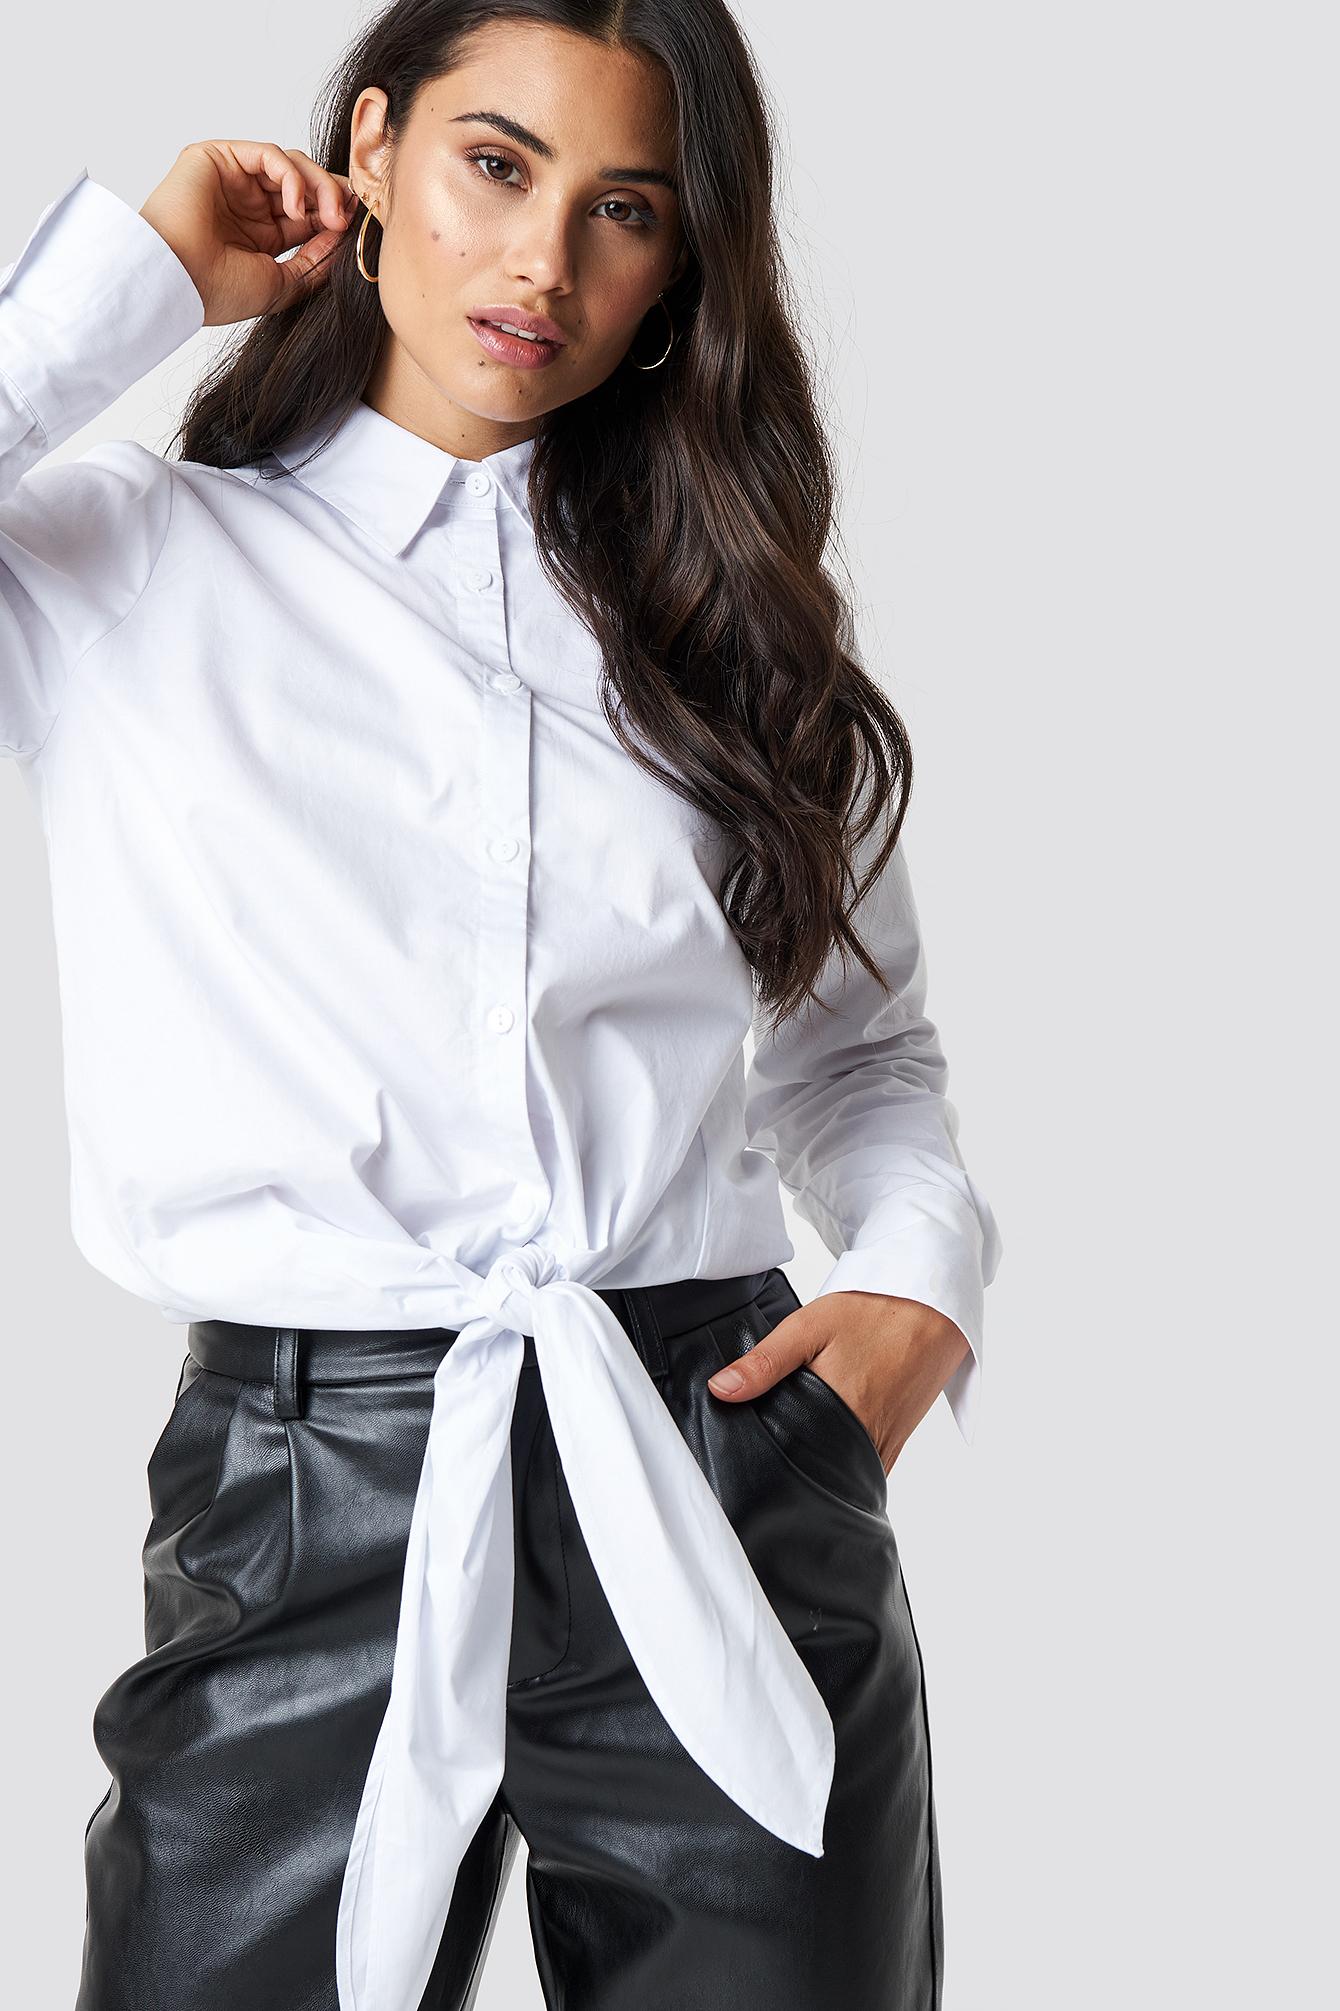 CHLOEXNAKD Oversized Knot Shirt - White